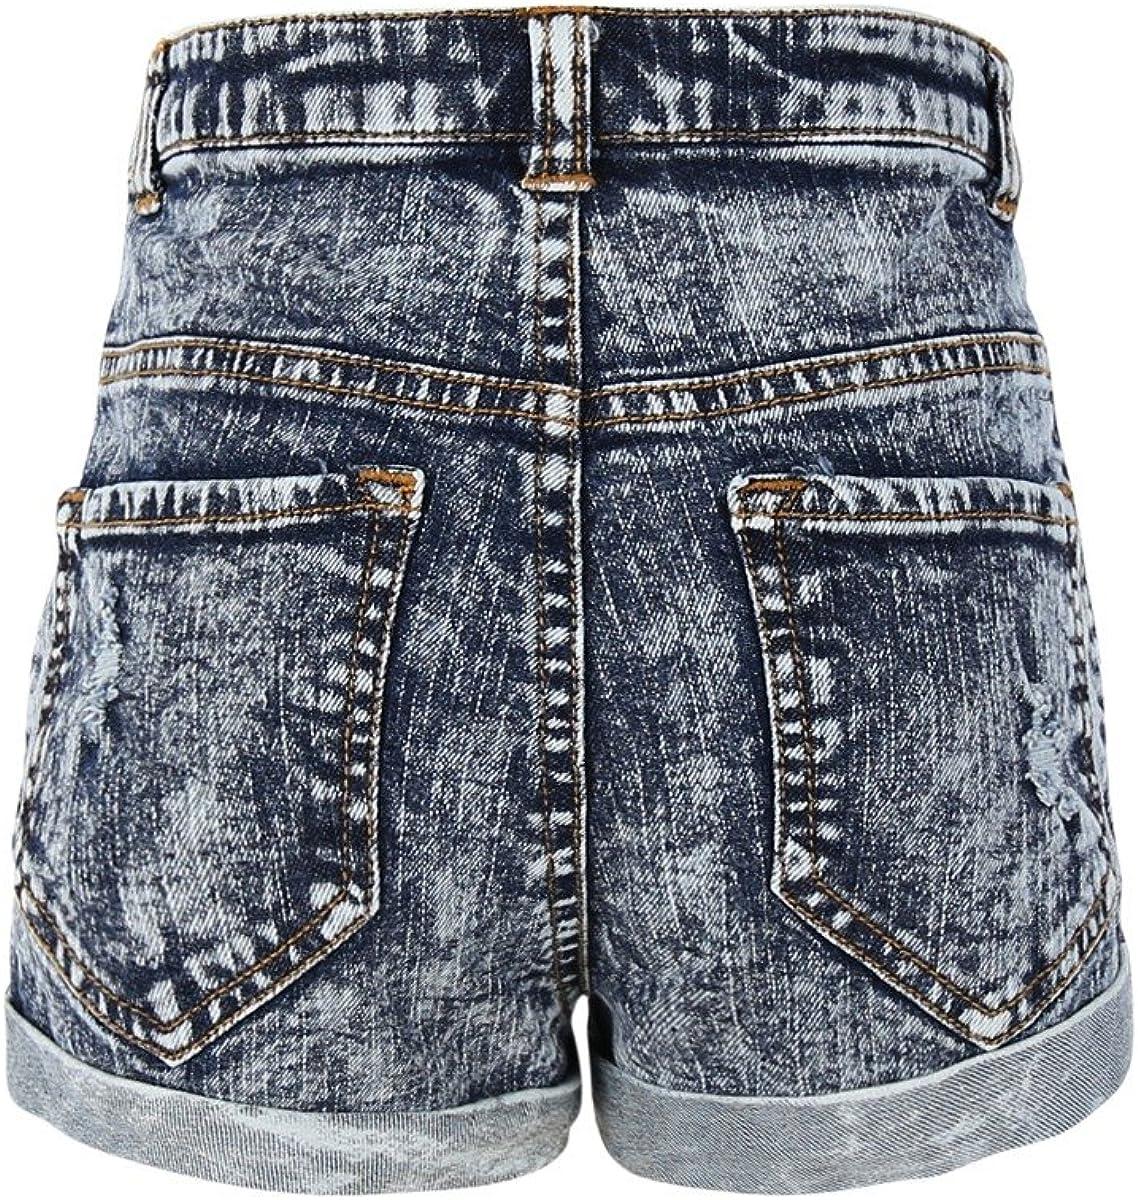 Bienzoe Girls Summer Denim High Waist Holes Ripped Jeans Shorts